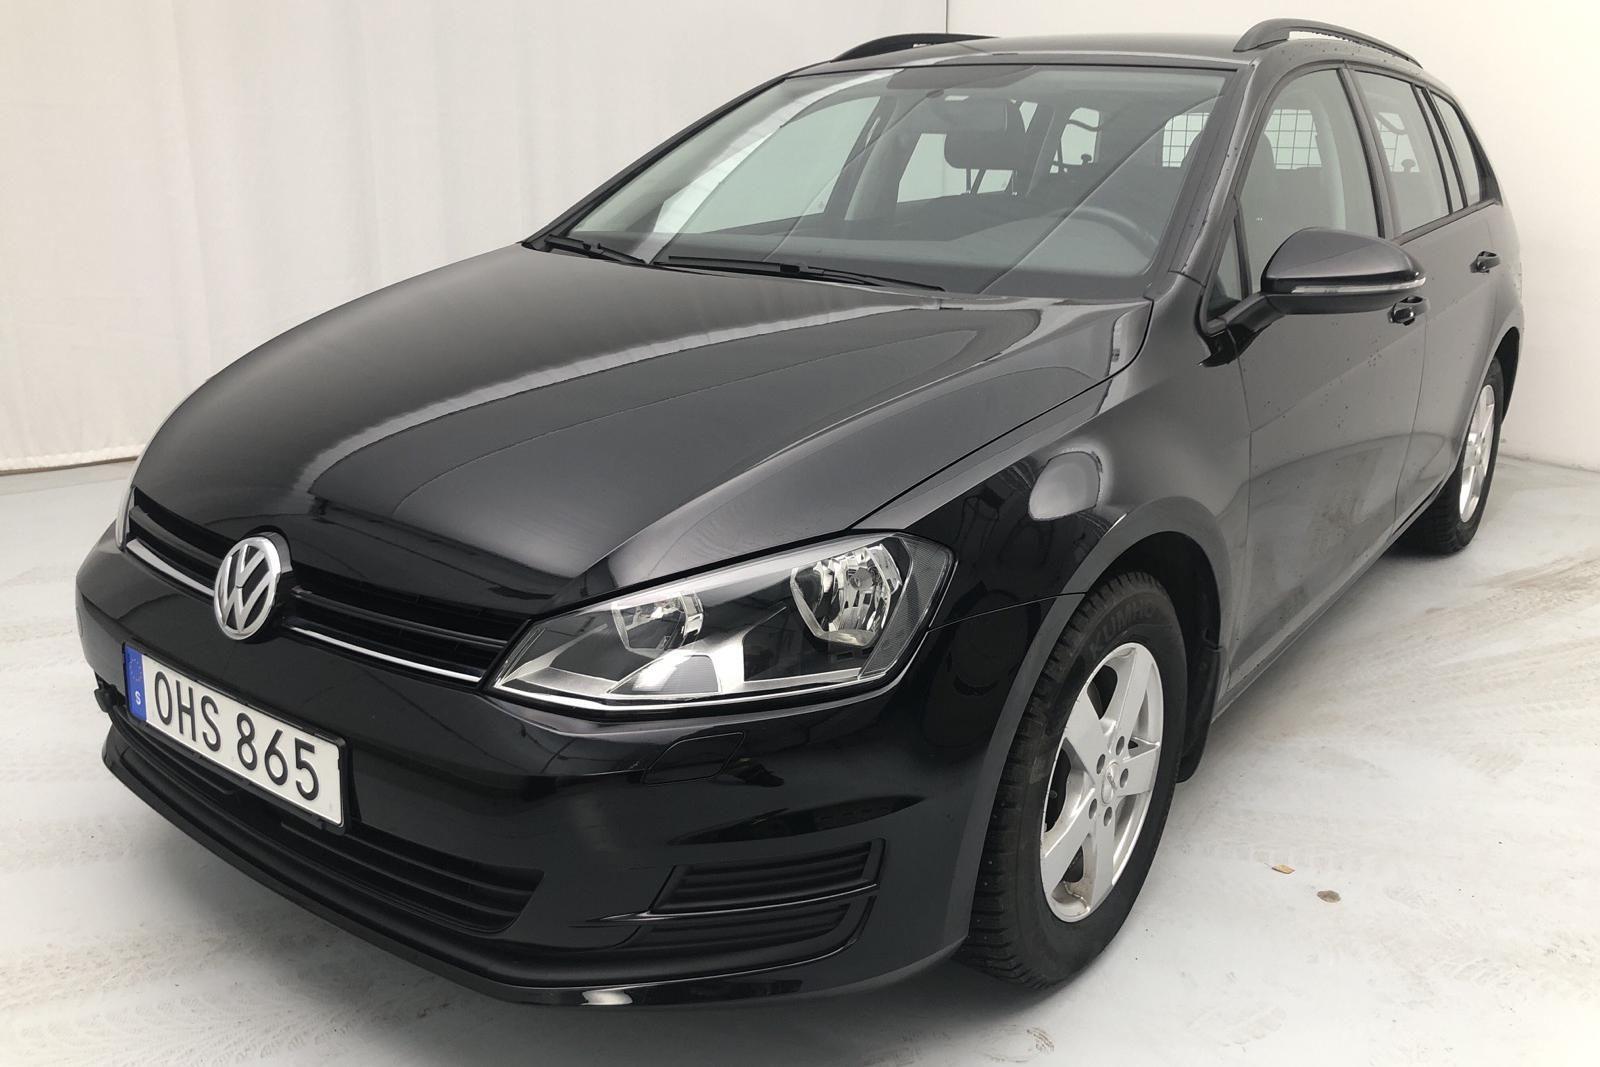 VW Golf VII 1.6 TDI BlueMotion Sportscombi 4Motion (110hk)